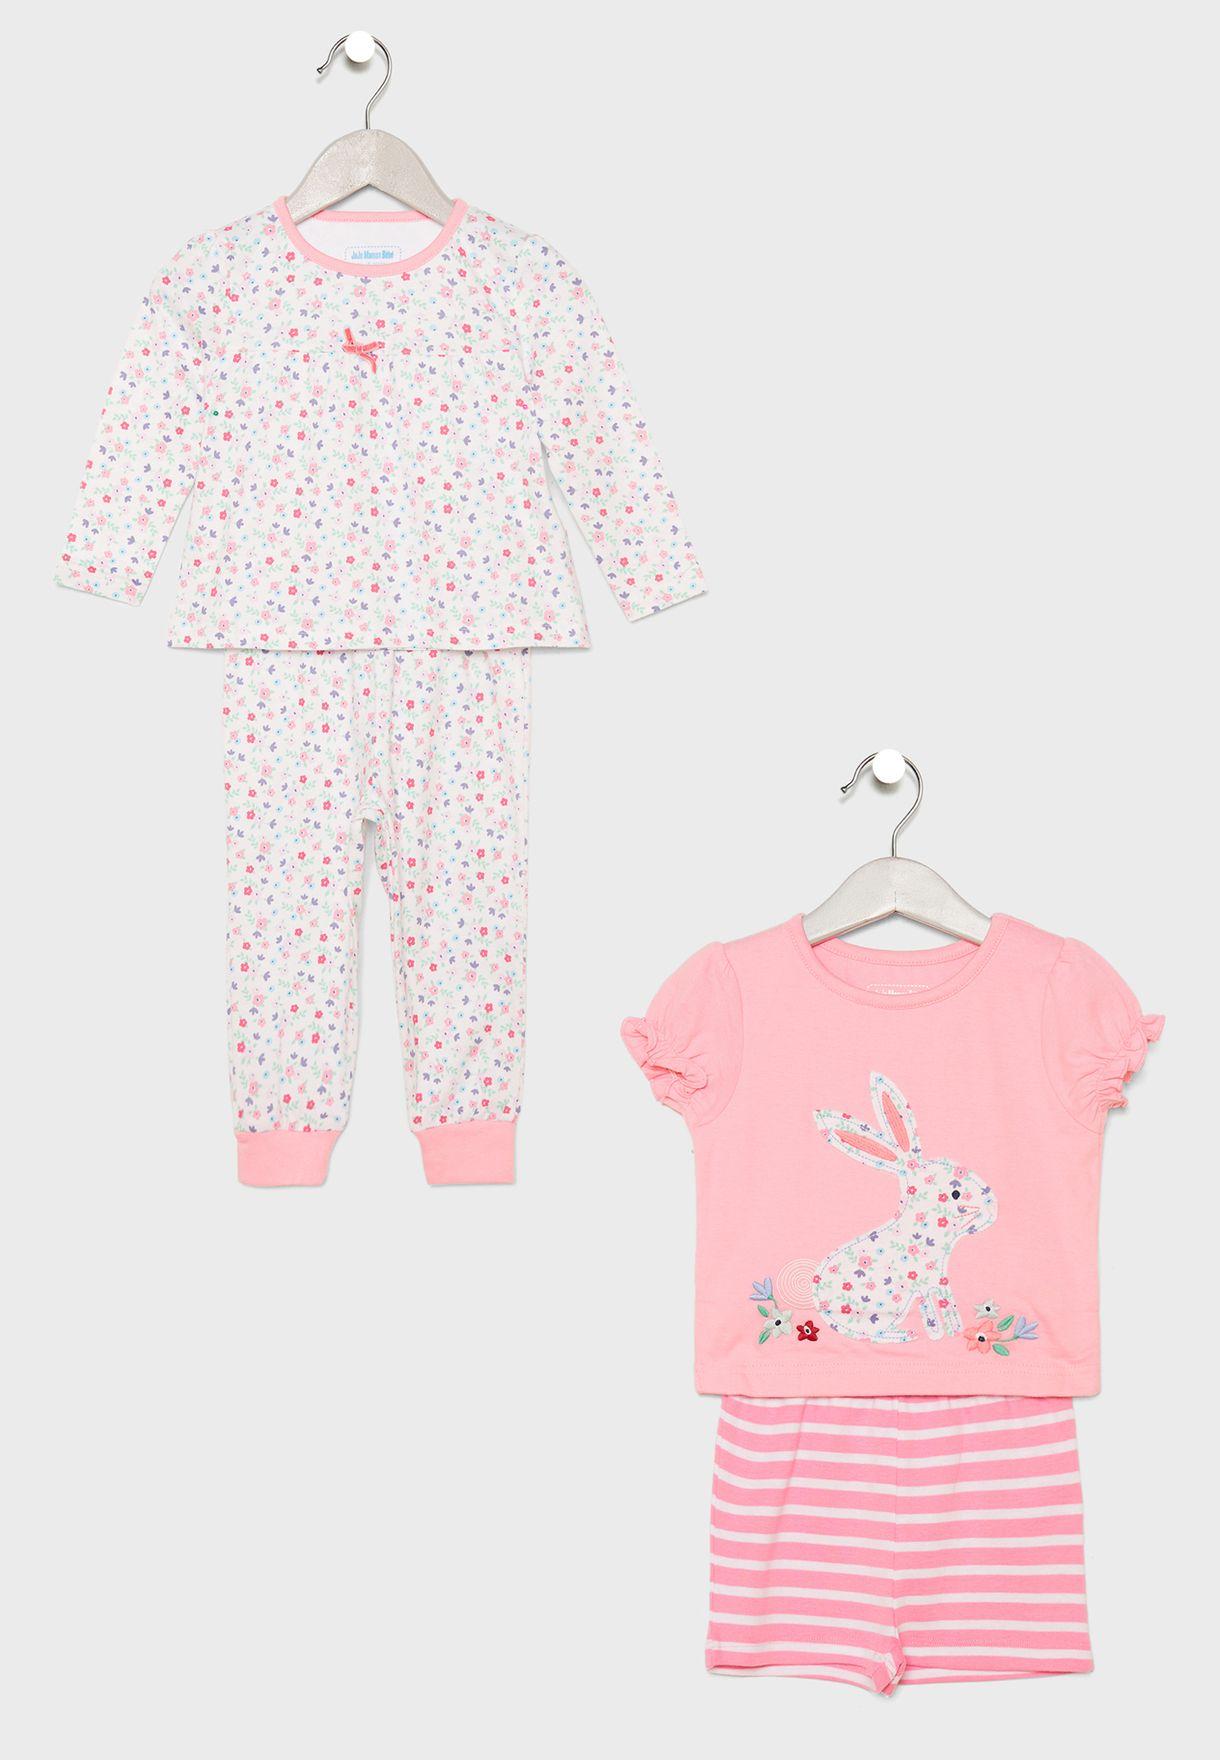 b2b8550f5db8e Shop Jojo Maman Bebe prints Kids 2 Pack Printed Pyjama Set E1110 for Kids  in UAE - 11128AT21ZGP